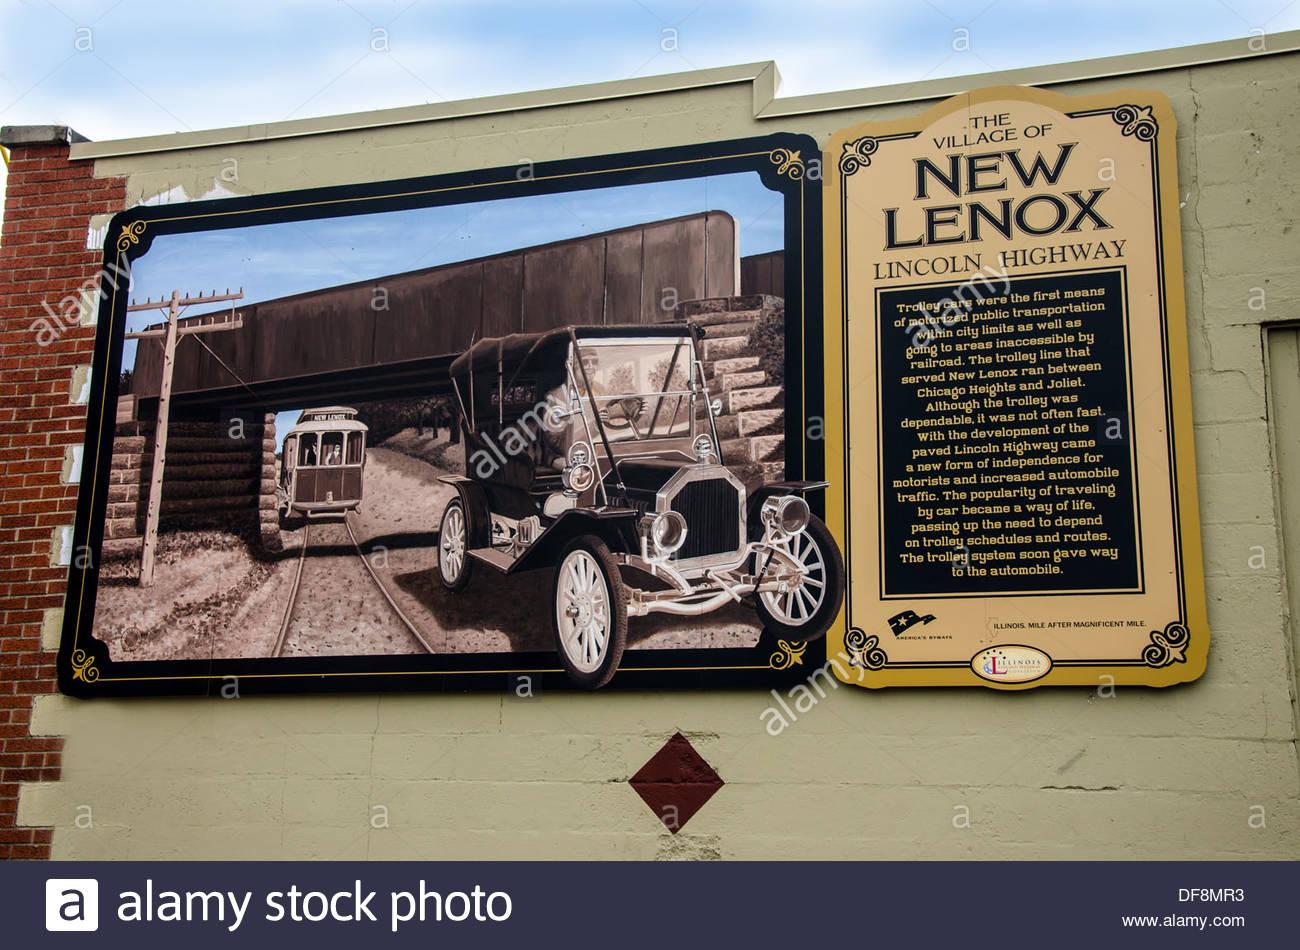 Lincoln Highway Interpretive mural in  New Lenox Illinois - Stock Image